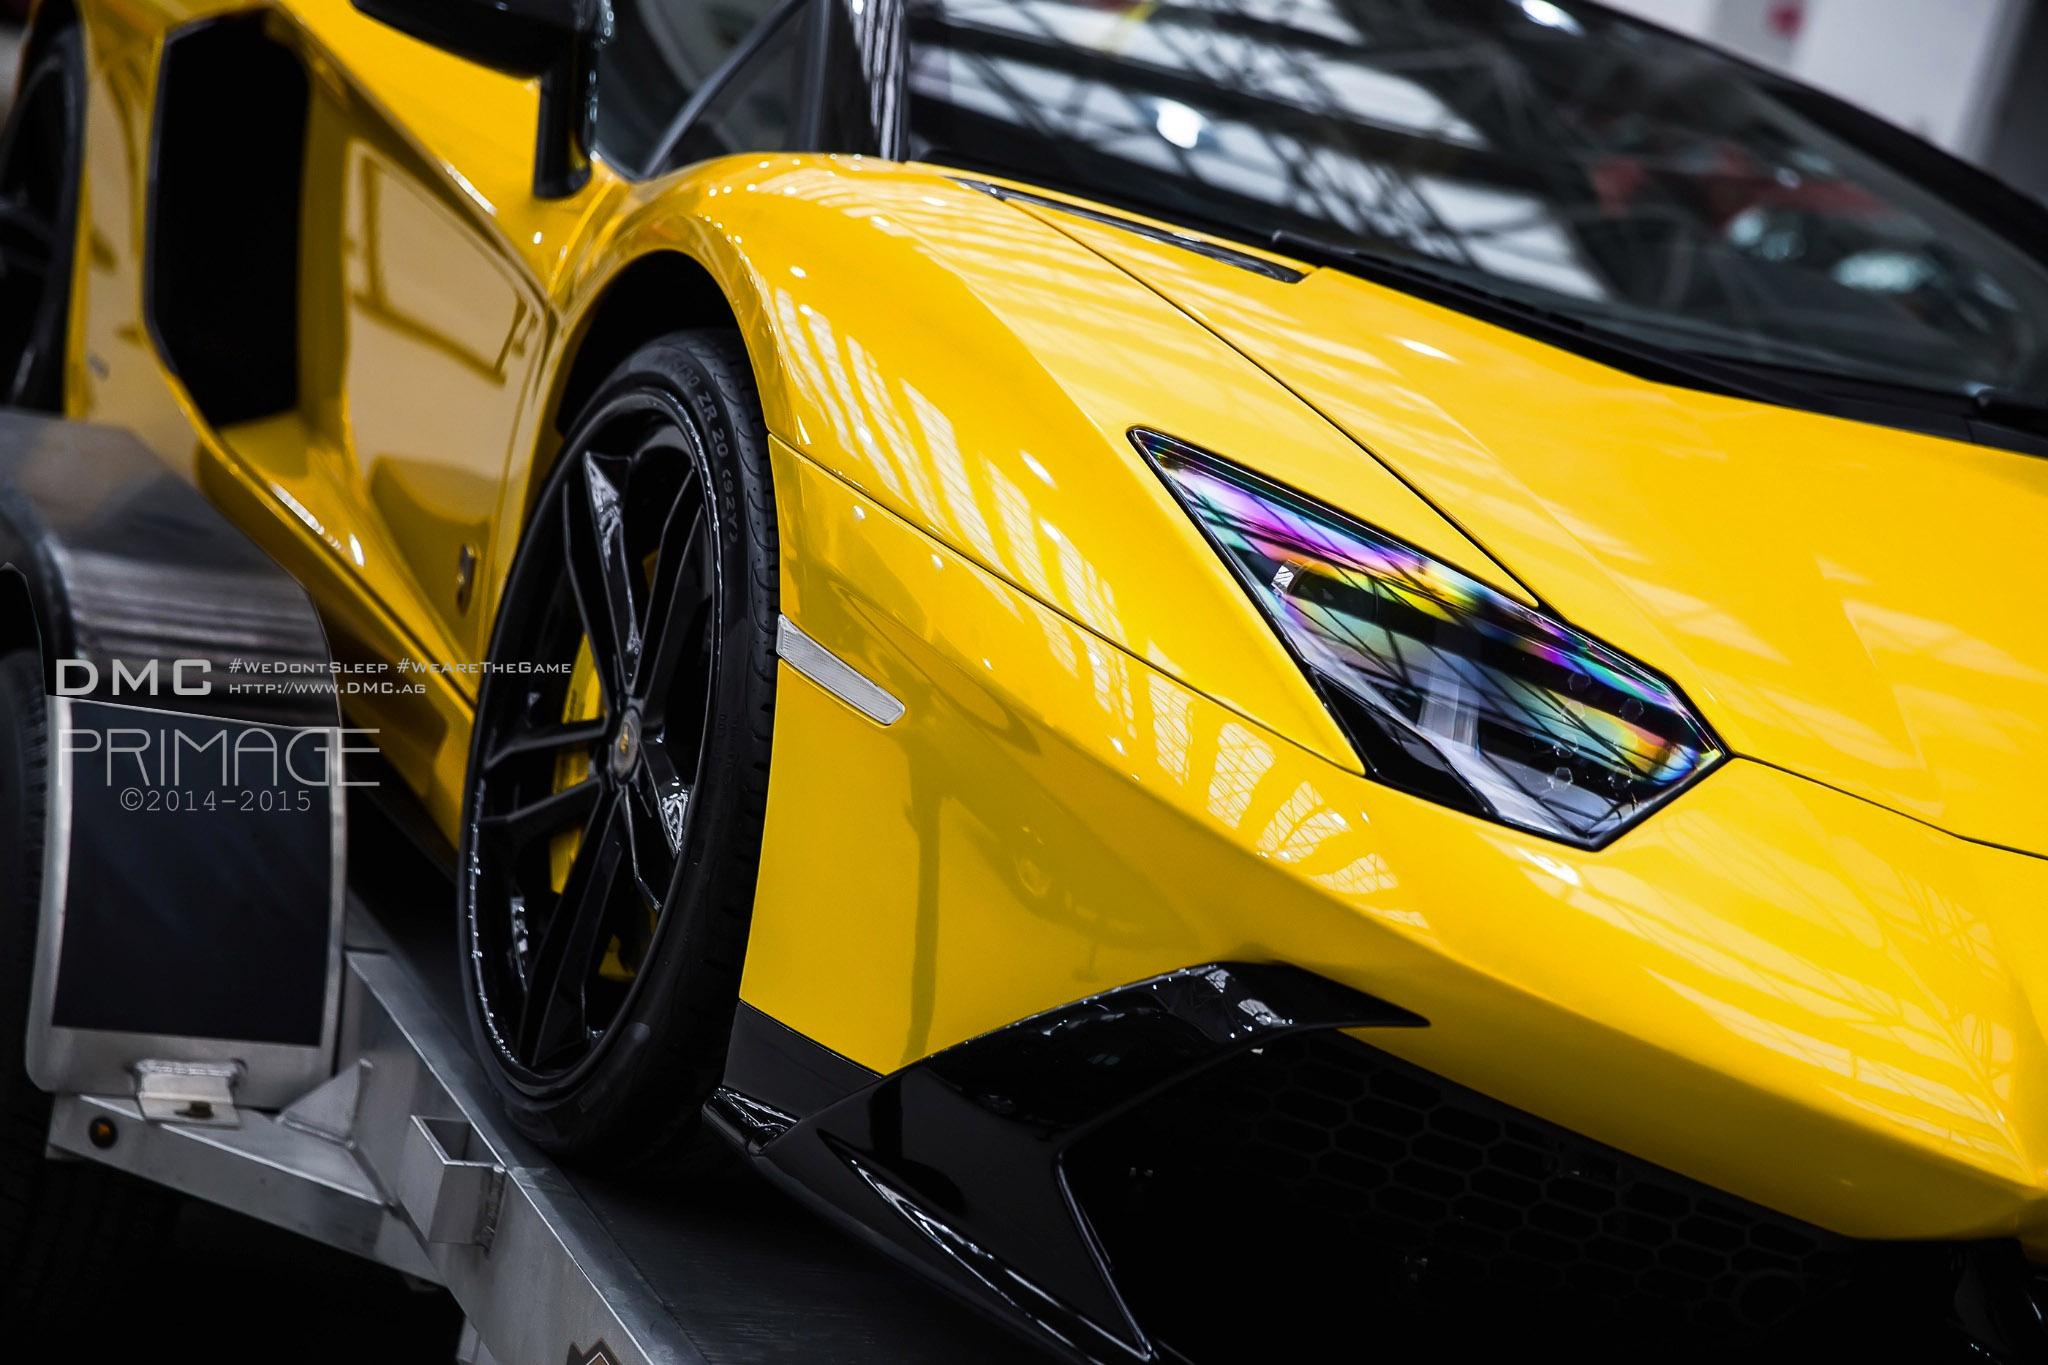 DMC Lamborghini Aventador LP720 Roadster photo #2